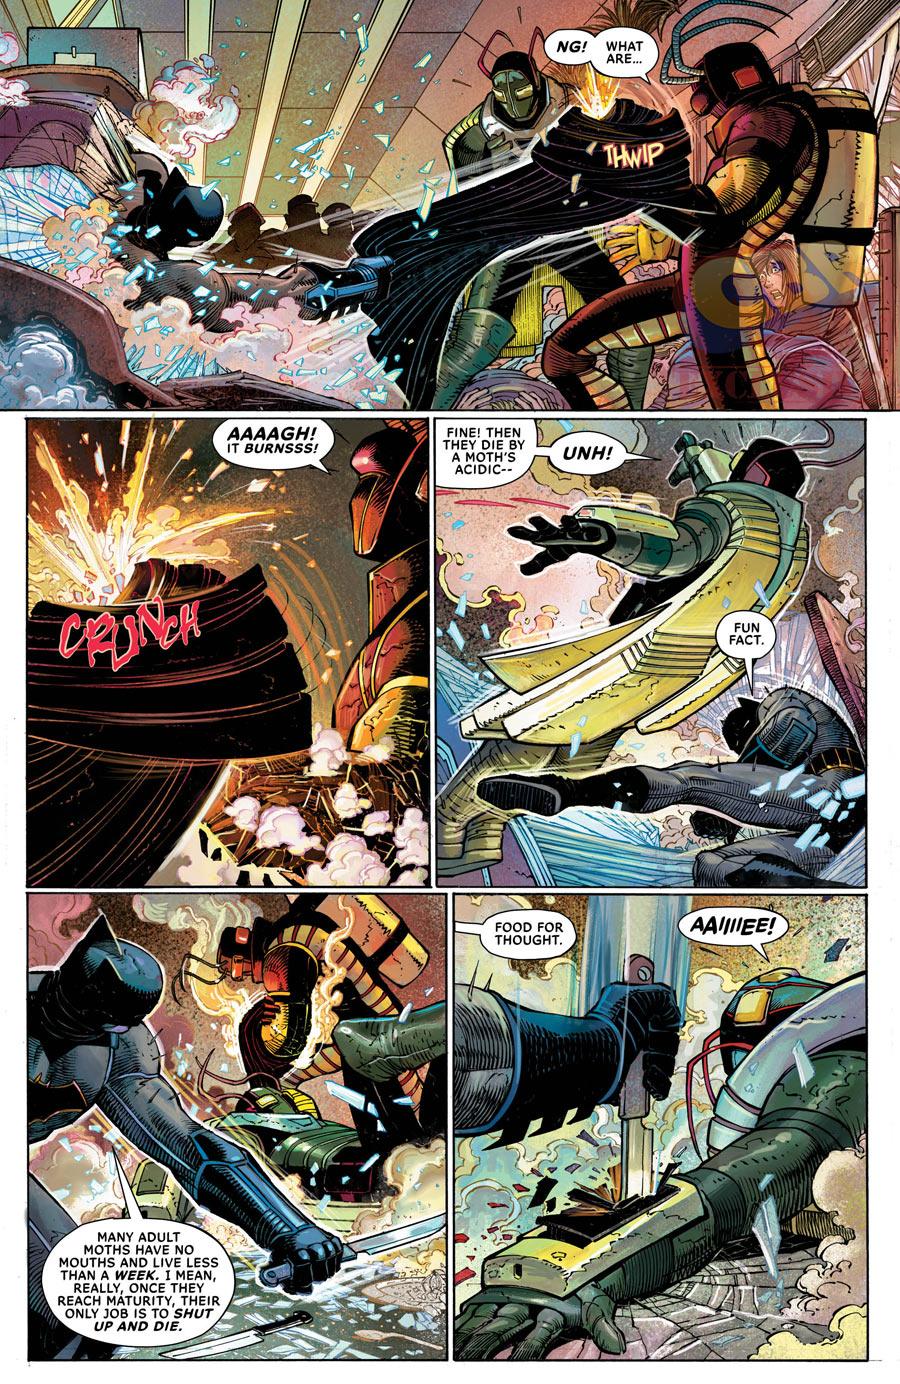 Preview: All-Star Batman #1 Dark Knight News